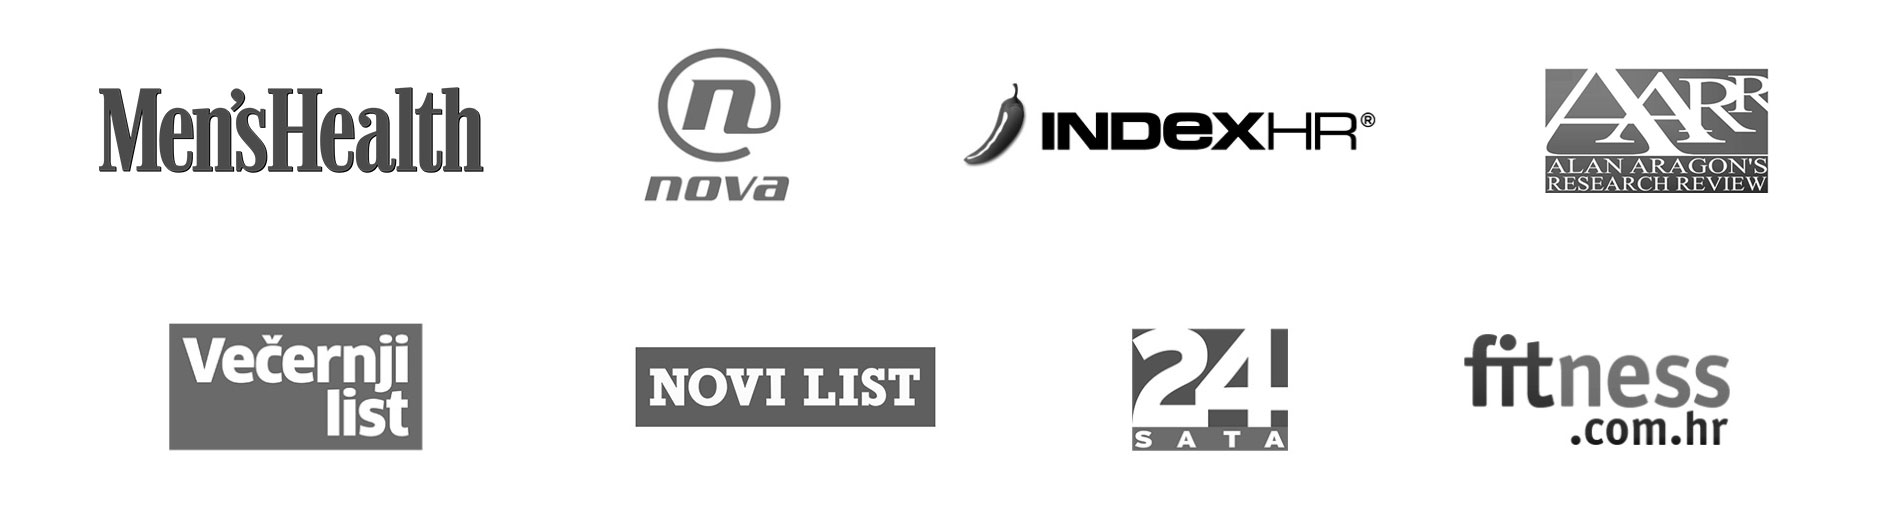 logos_press_072019.jpg